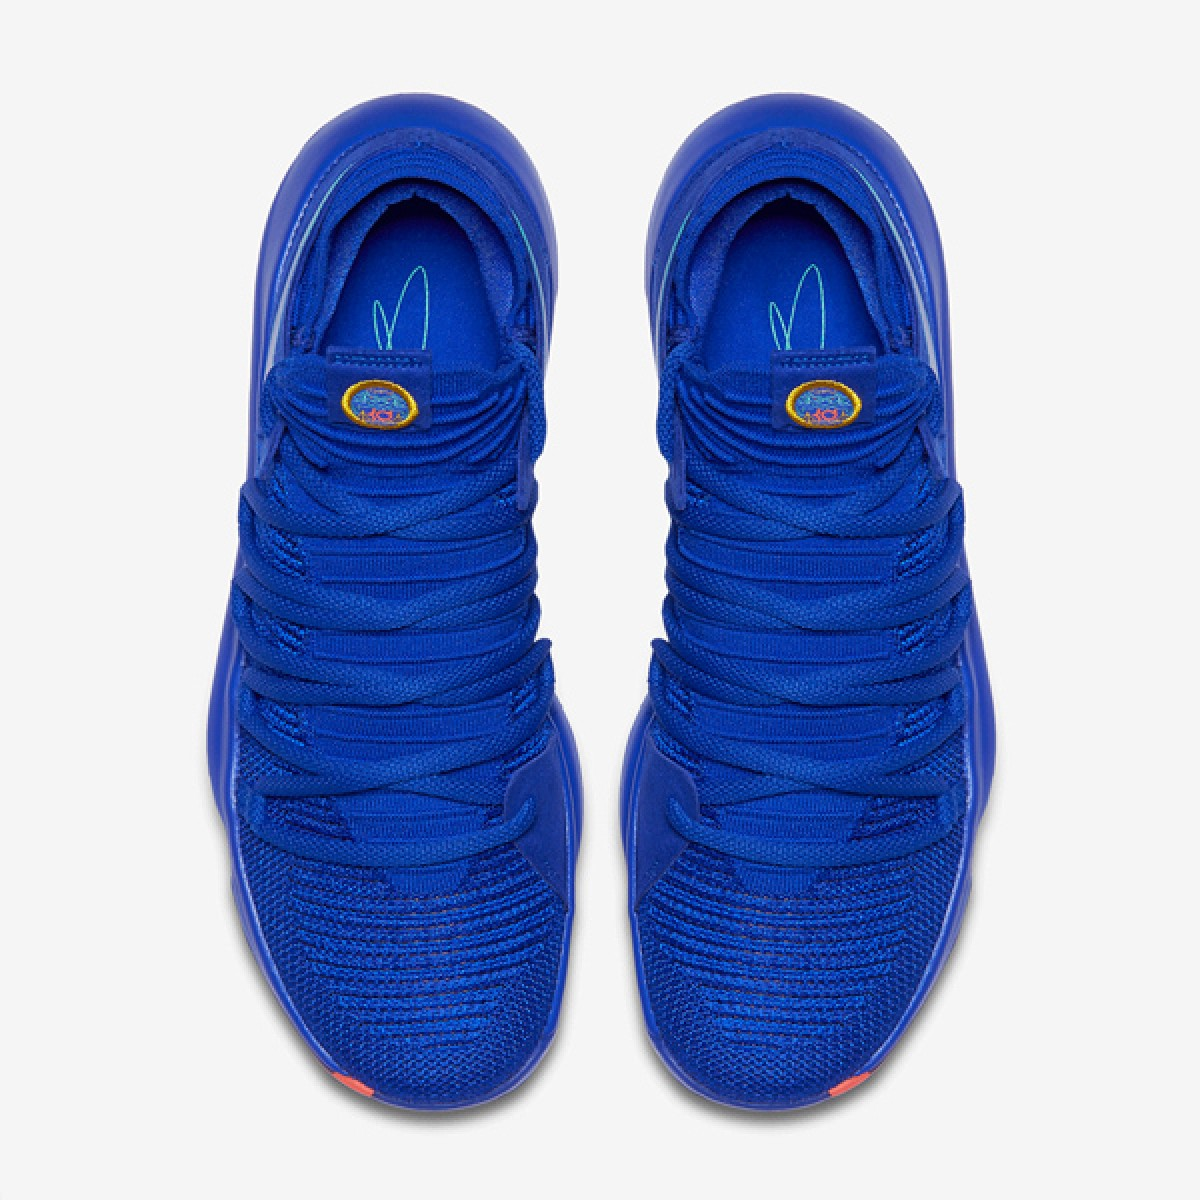 Nike KD X 'City Edition' 897815-402